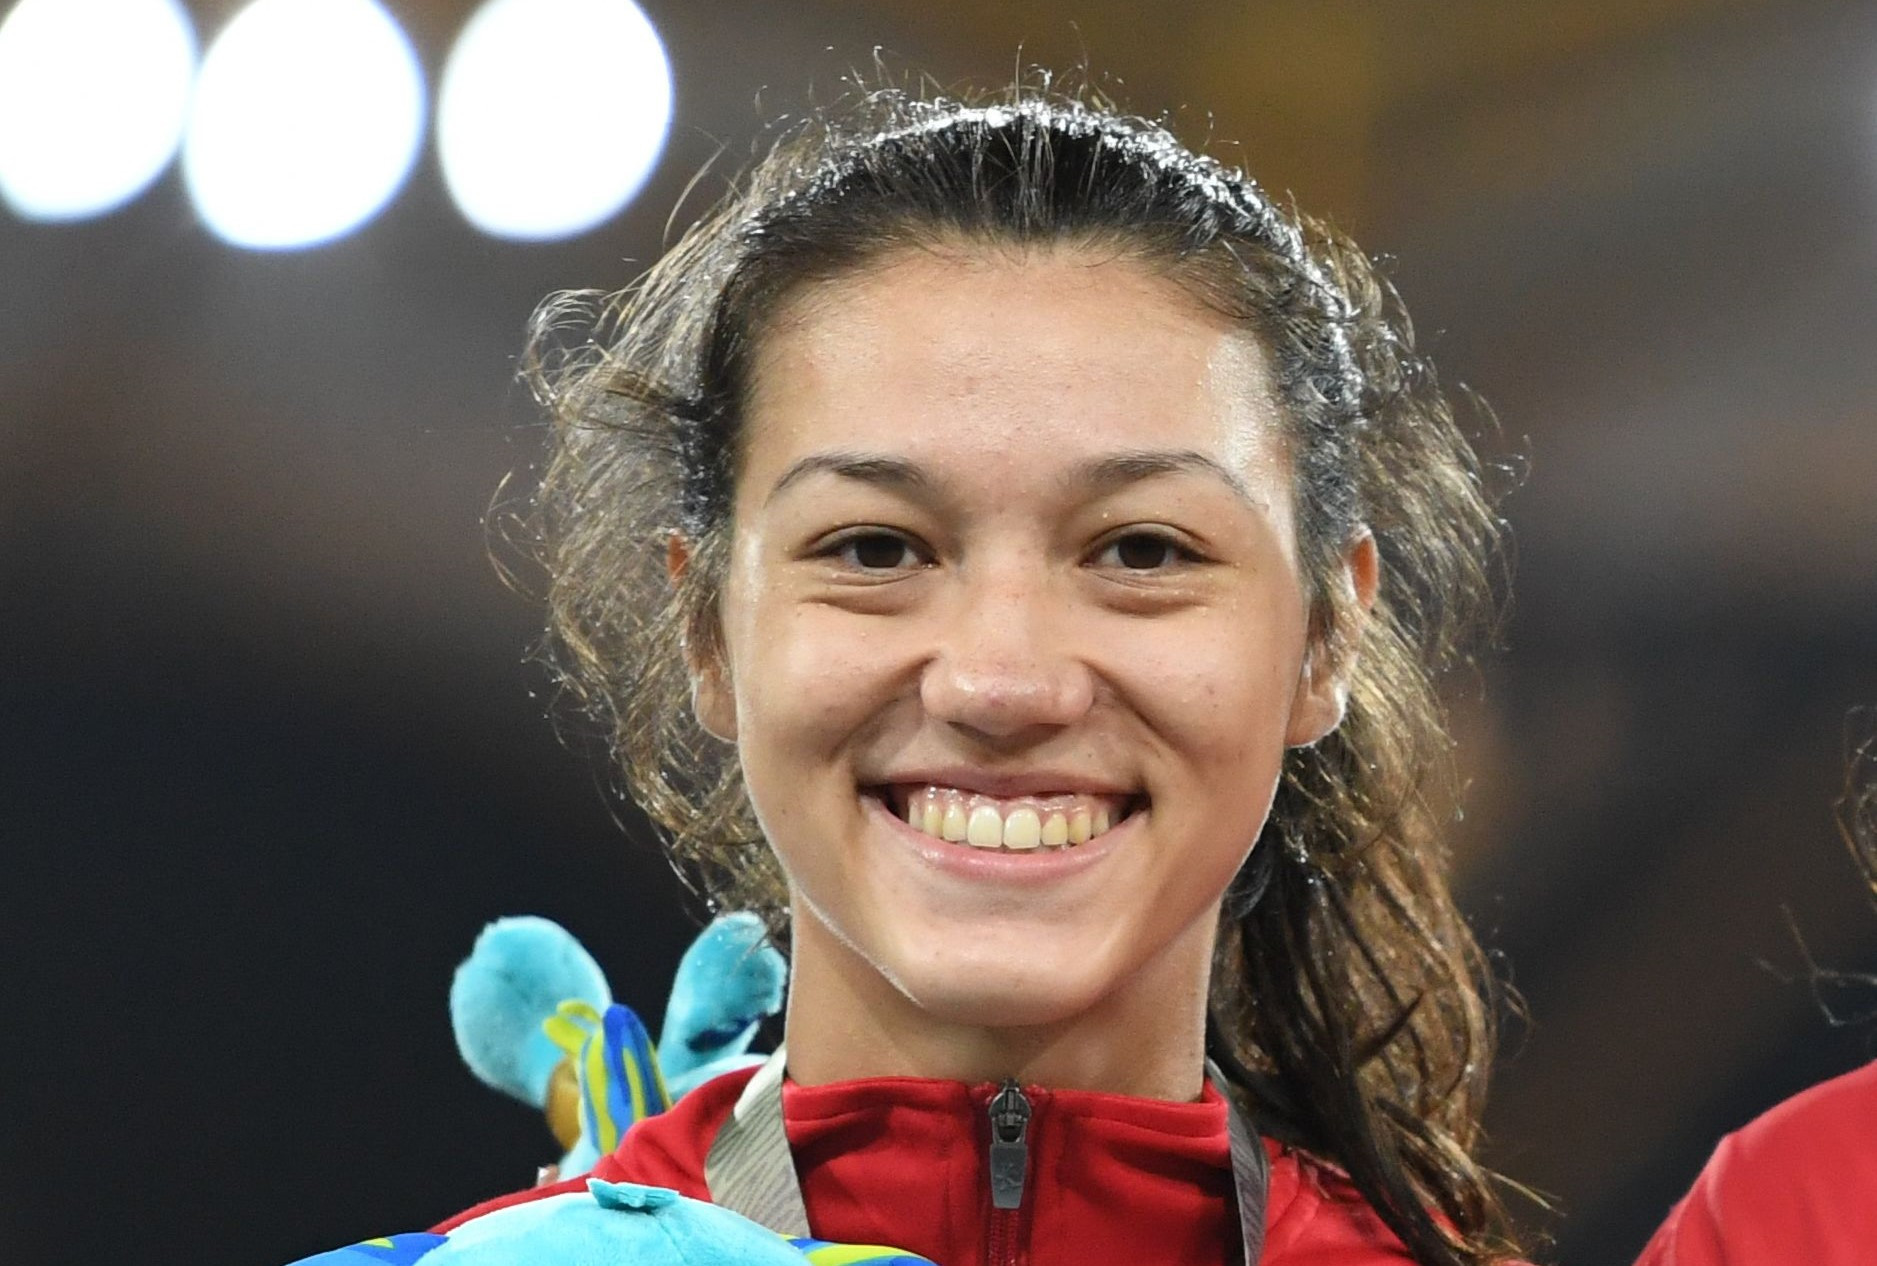 China's former Canadian Zheng wins heptathlon at World Athletics Challenge in Arona